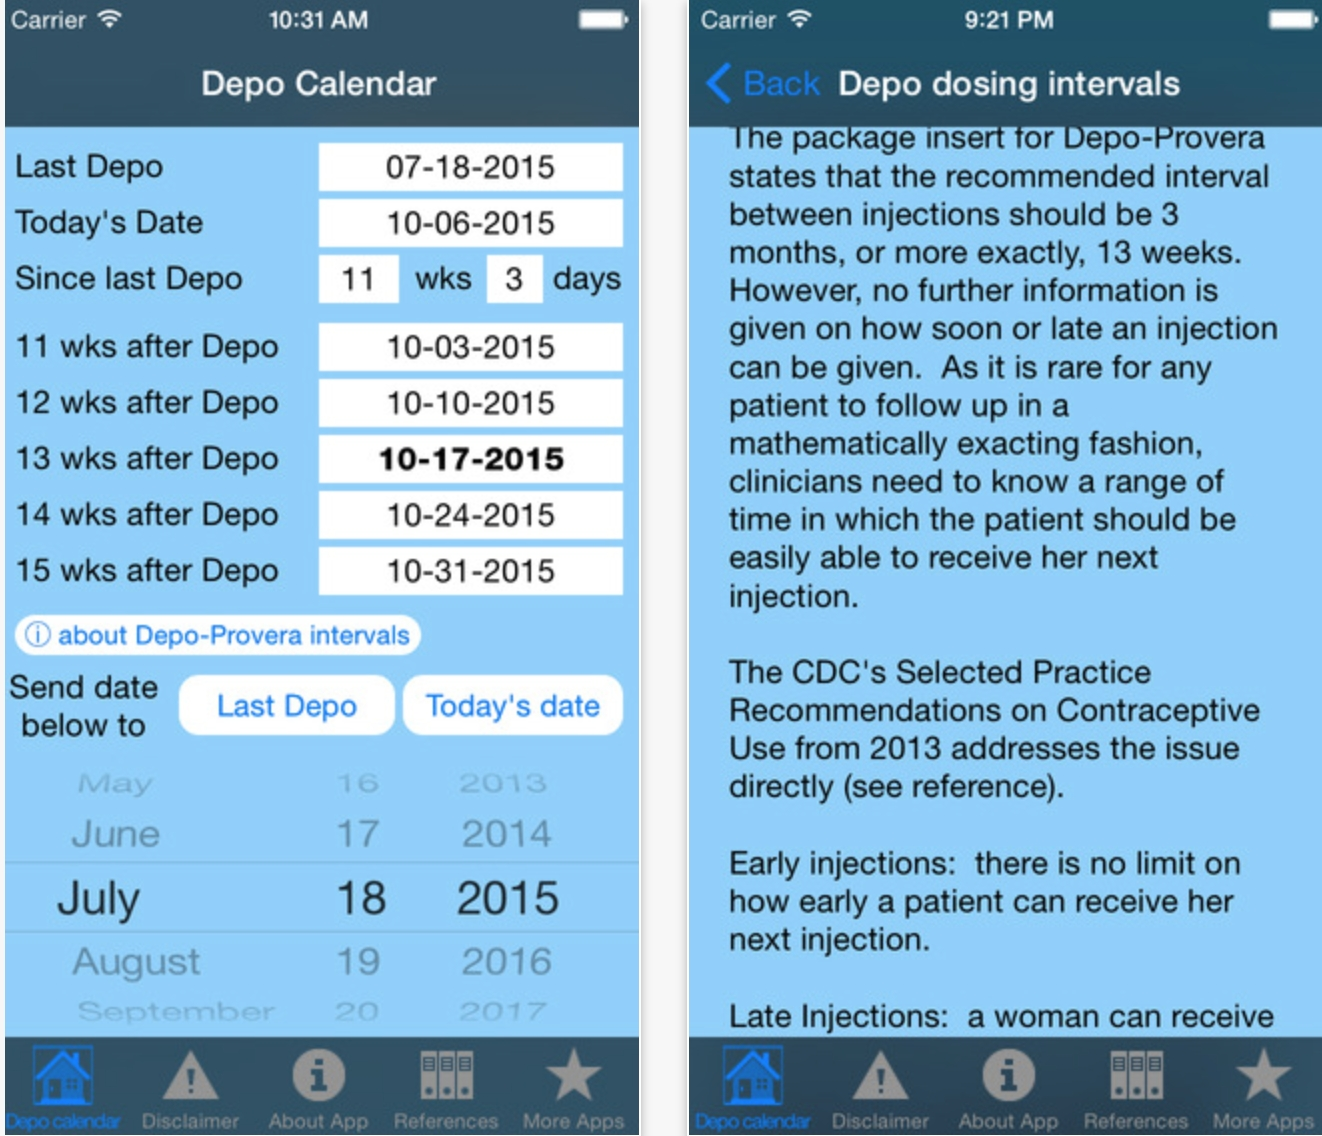 Depo Calendar App Could Significantly Improve Contraception  Depoprovera Calendar